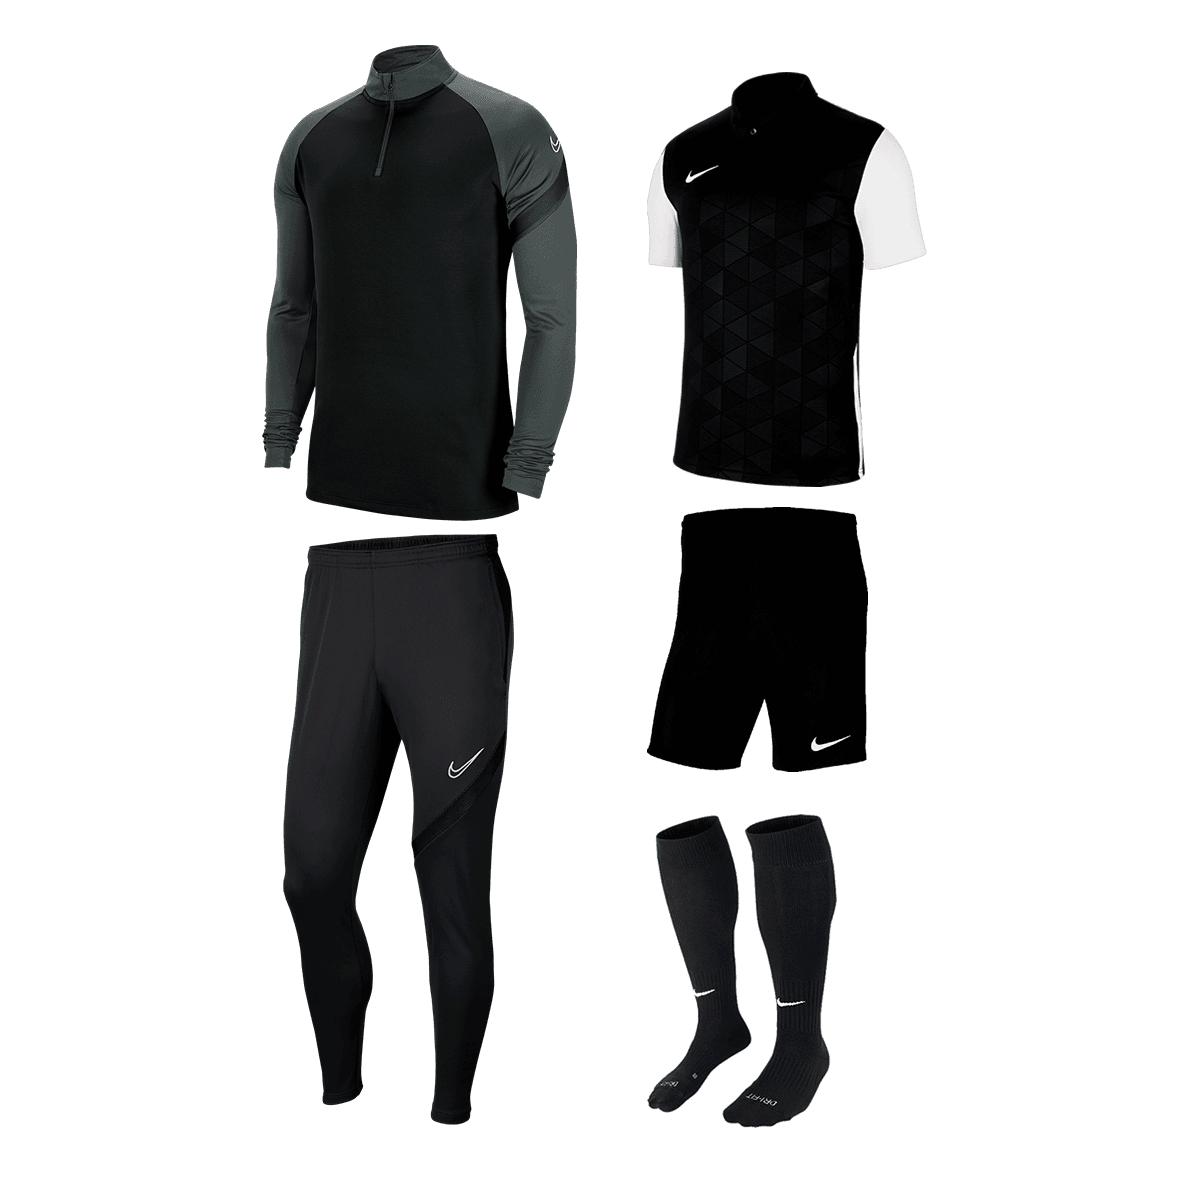 NIKE Premium 5-delige sportset - Mix & Match